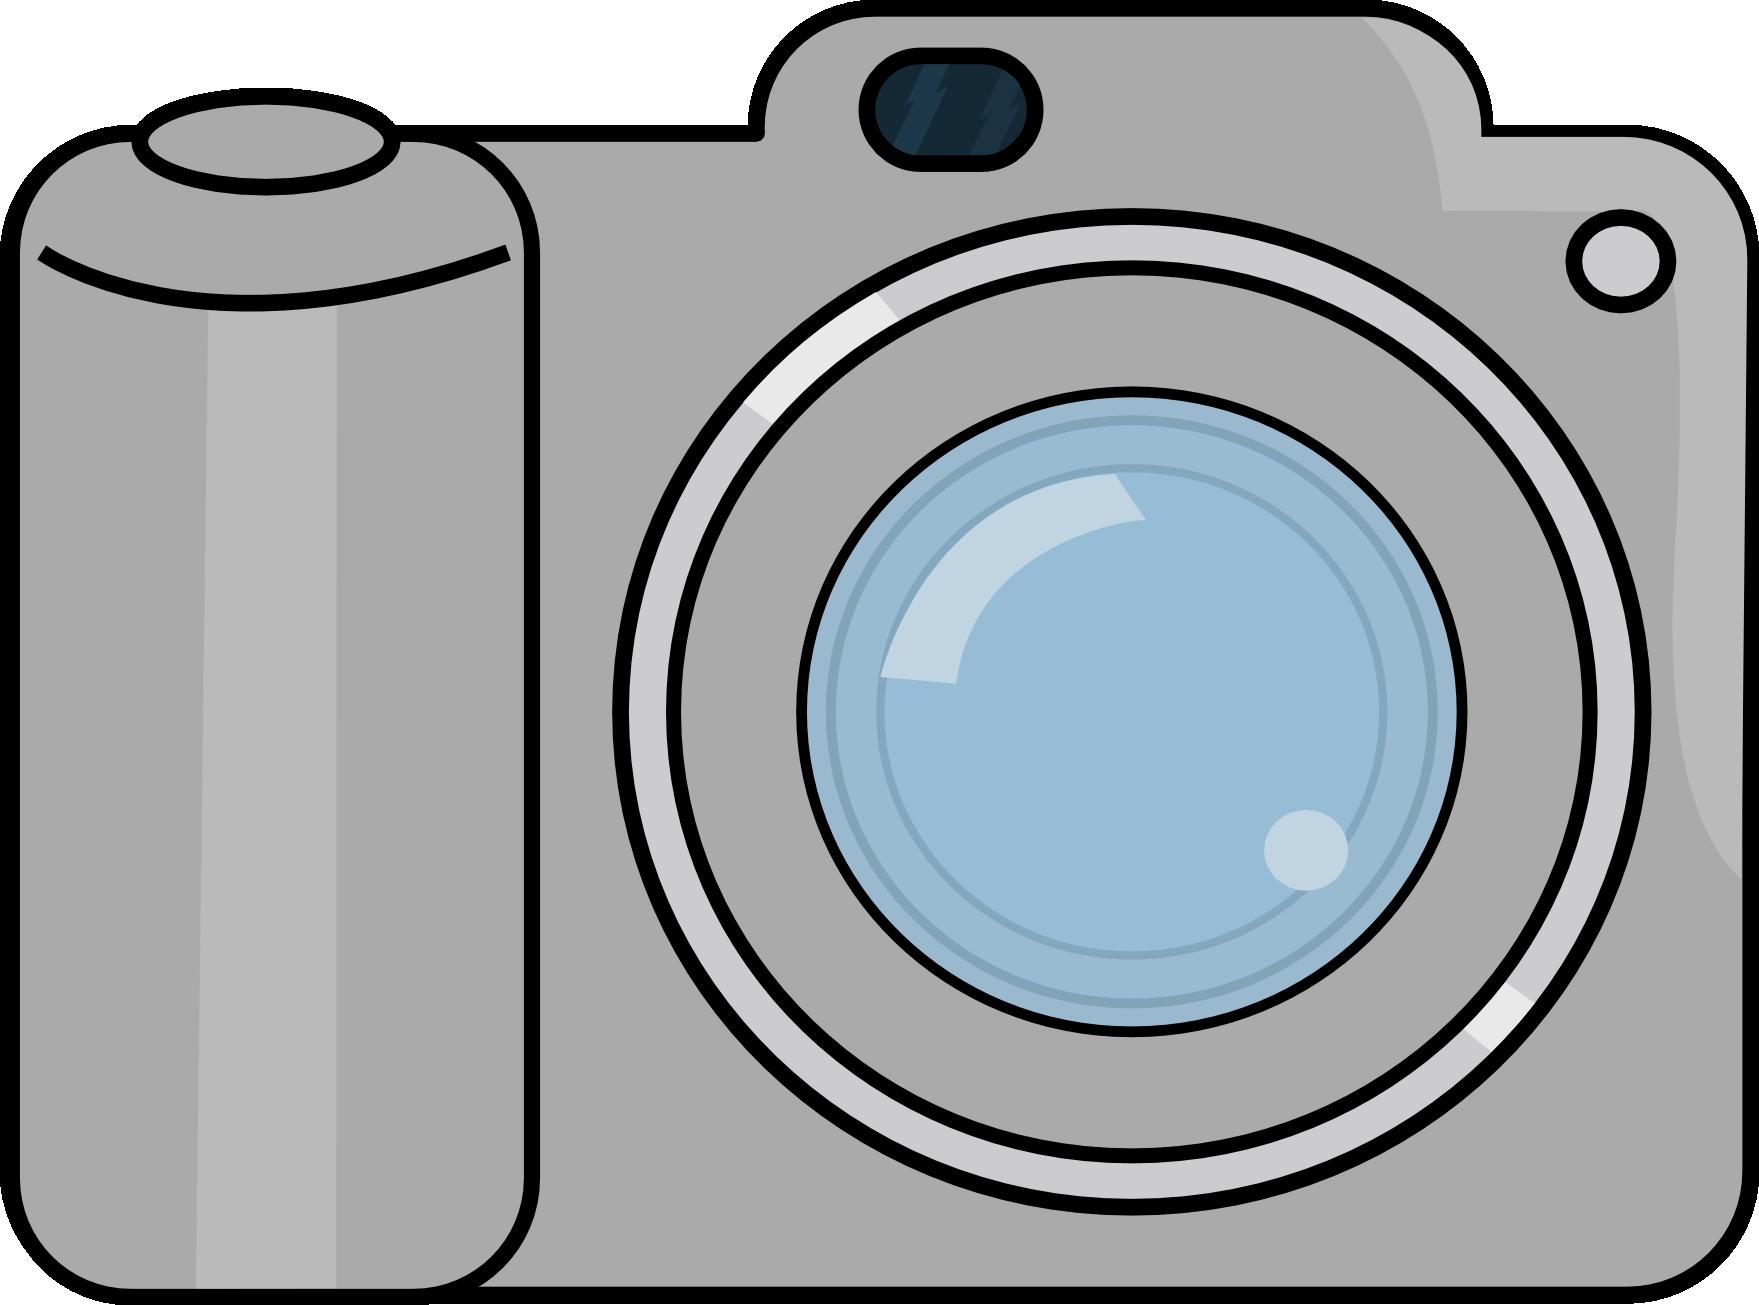 Free Cartoon Camera Cliparts, Download Free Clip Art, Free